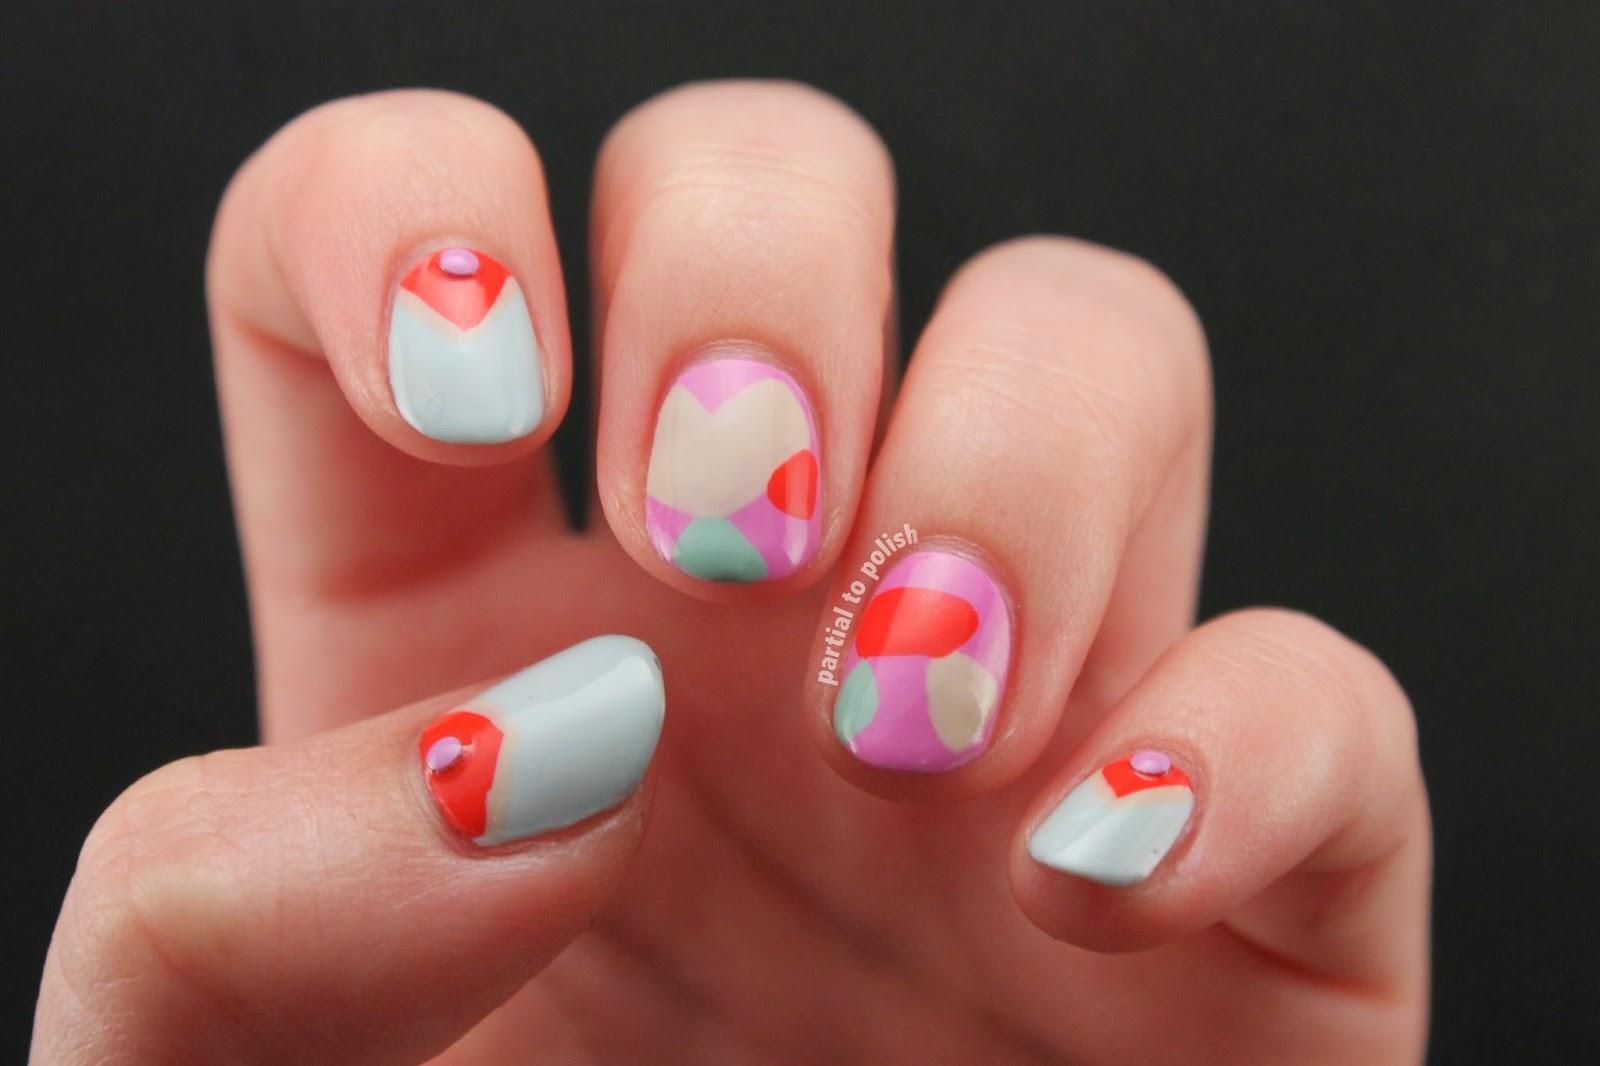 Born Pretty Store Pastel Stud Review & Mr. Candiipants Nail Art